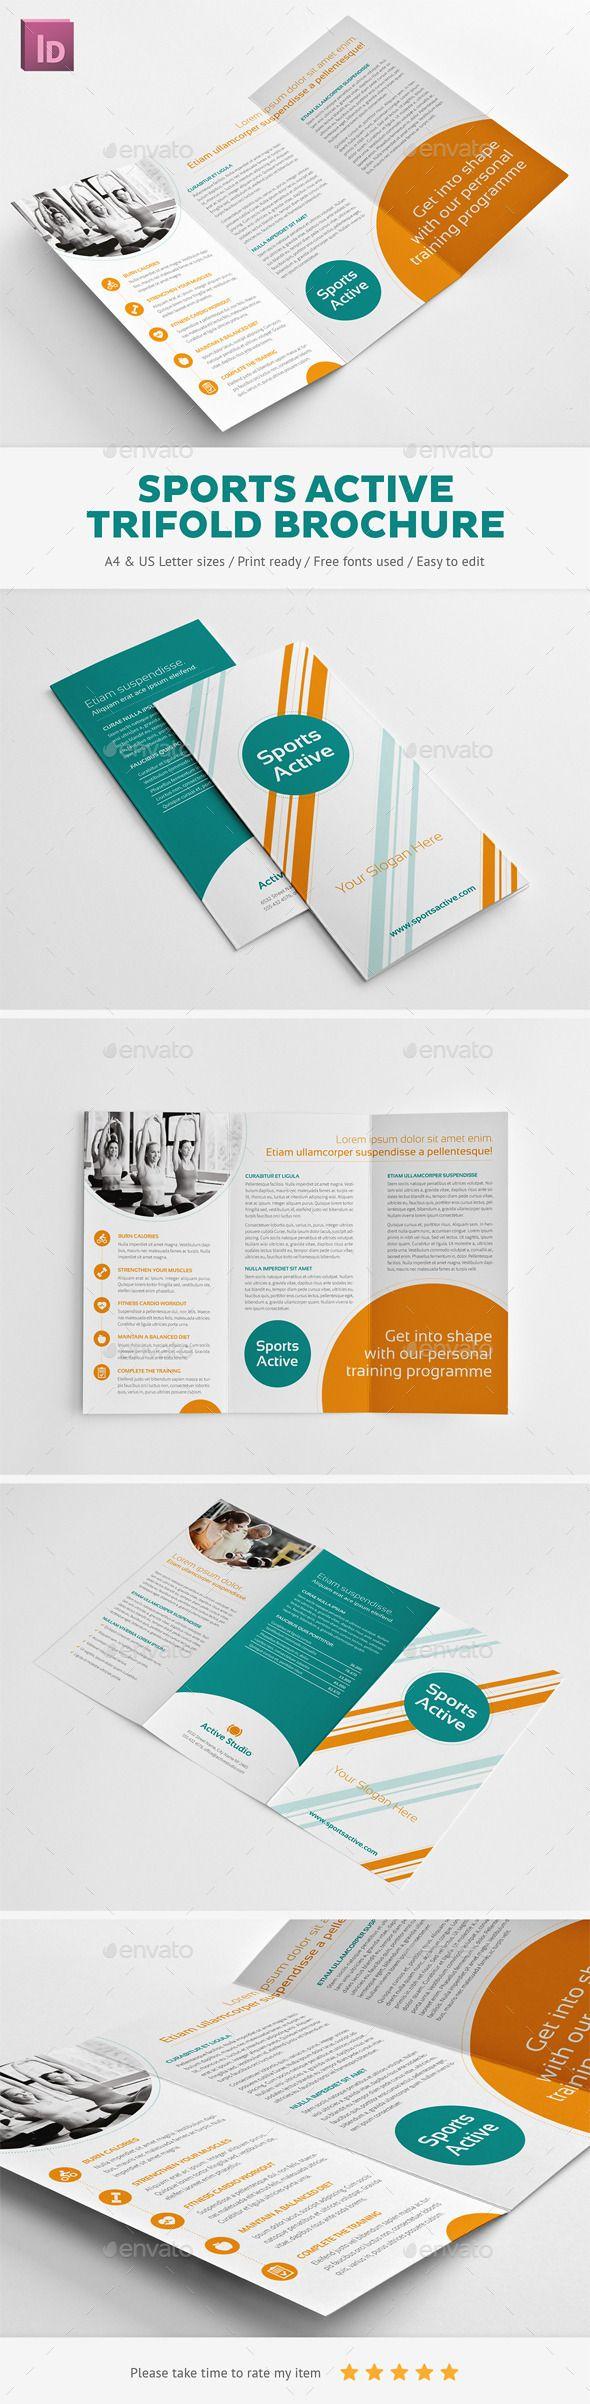 Sports Active Trifold Brochure — EPS Template | DESIGN. | Pinterest ...